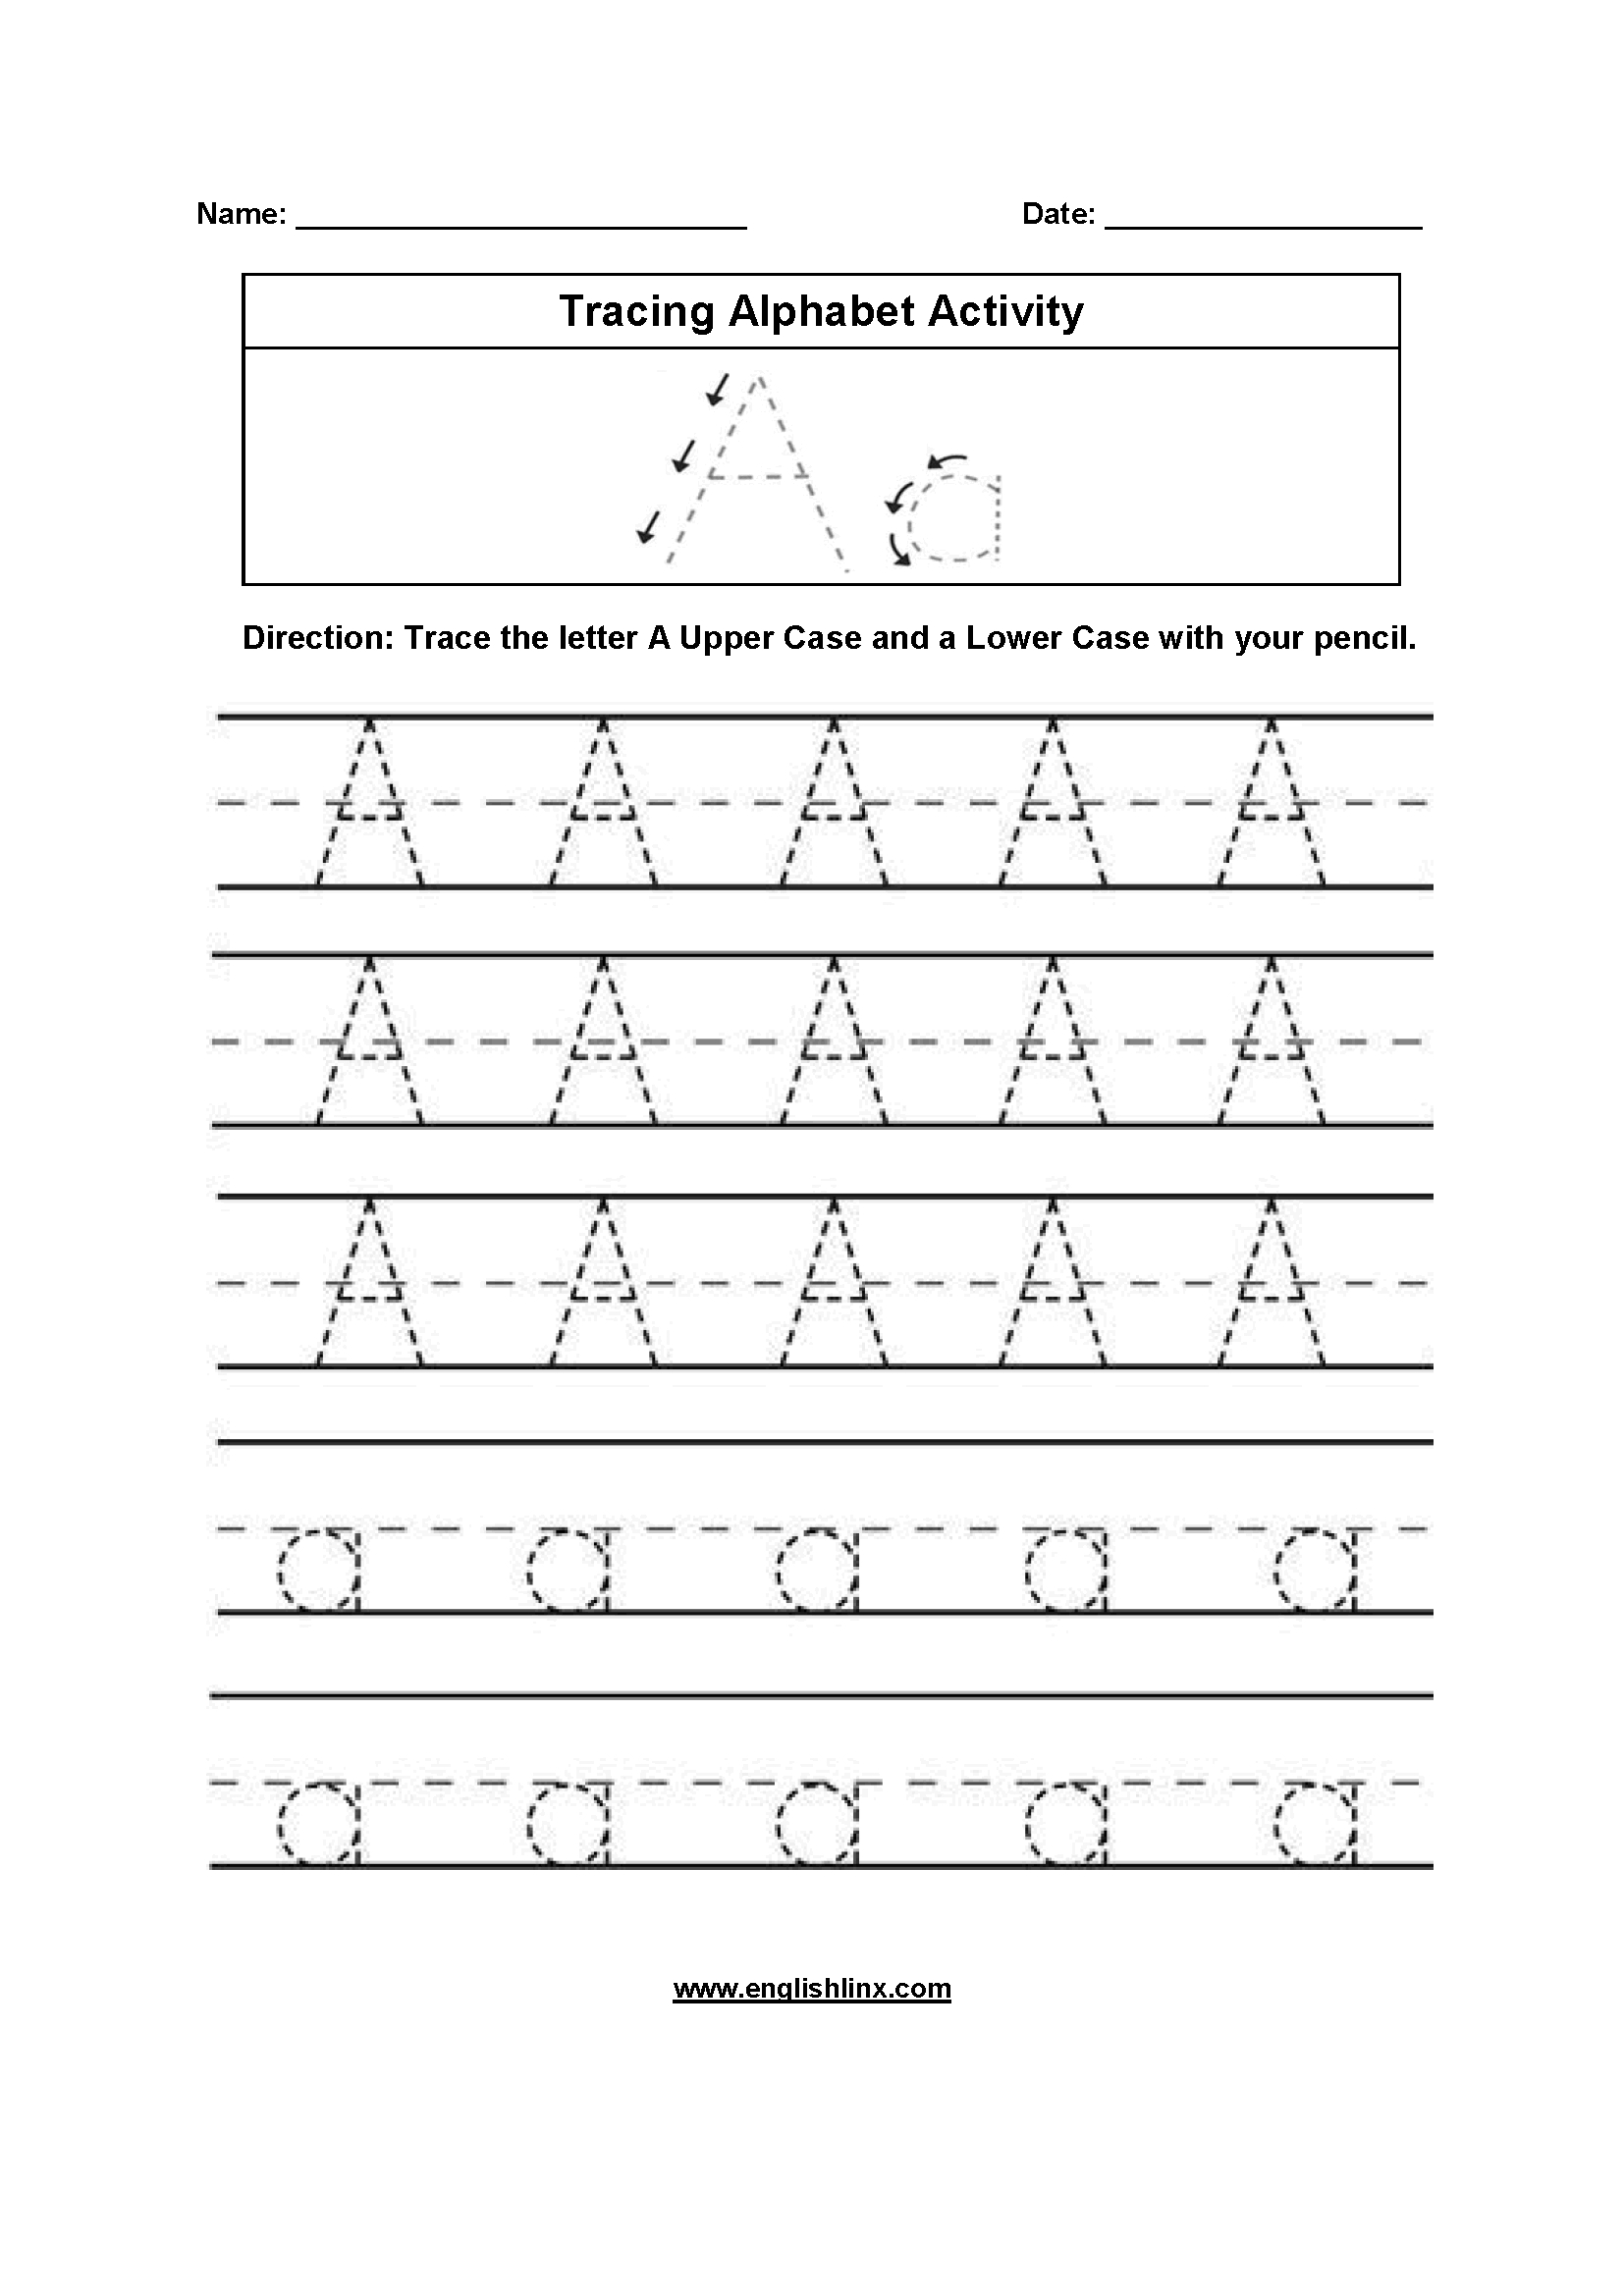 Alphabet Worksheets | Tracing Alphabet Worksheets in Alphabet Worksheets For 1St Grade